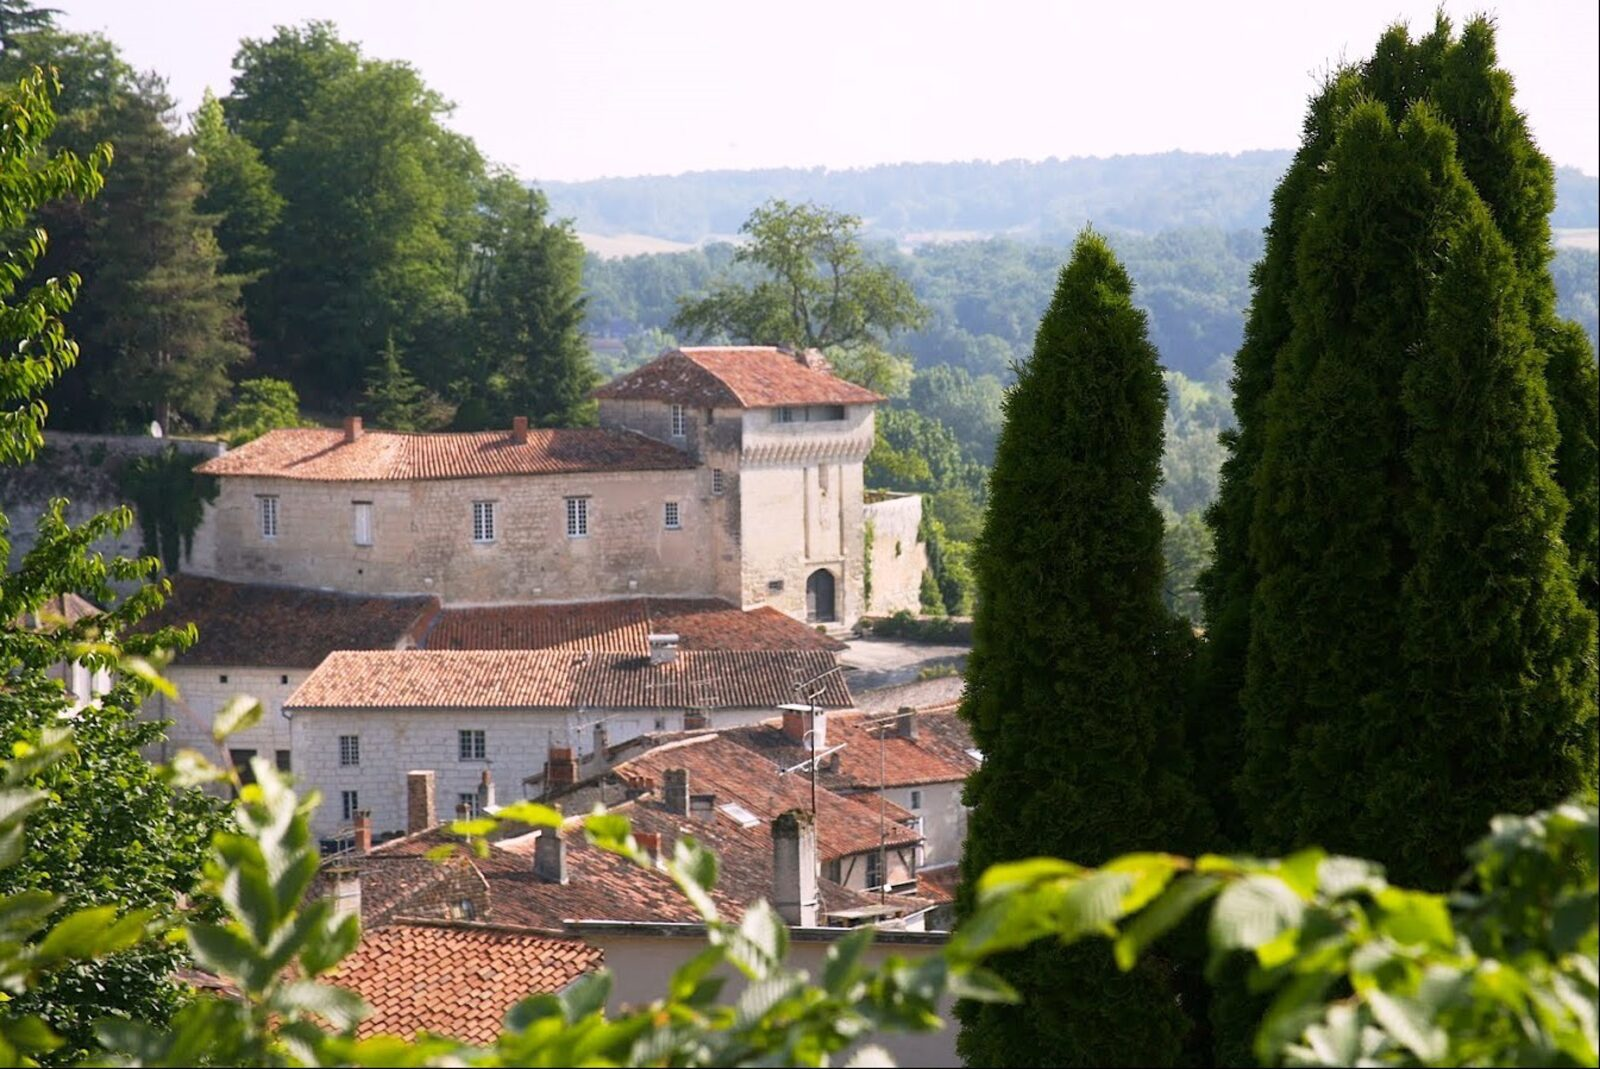 Domaine de Longeveau - Cerisier